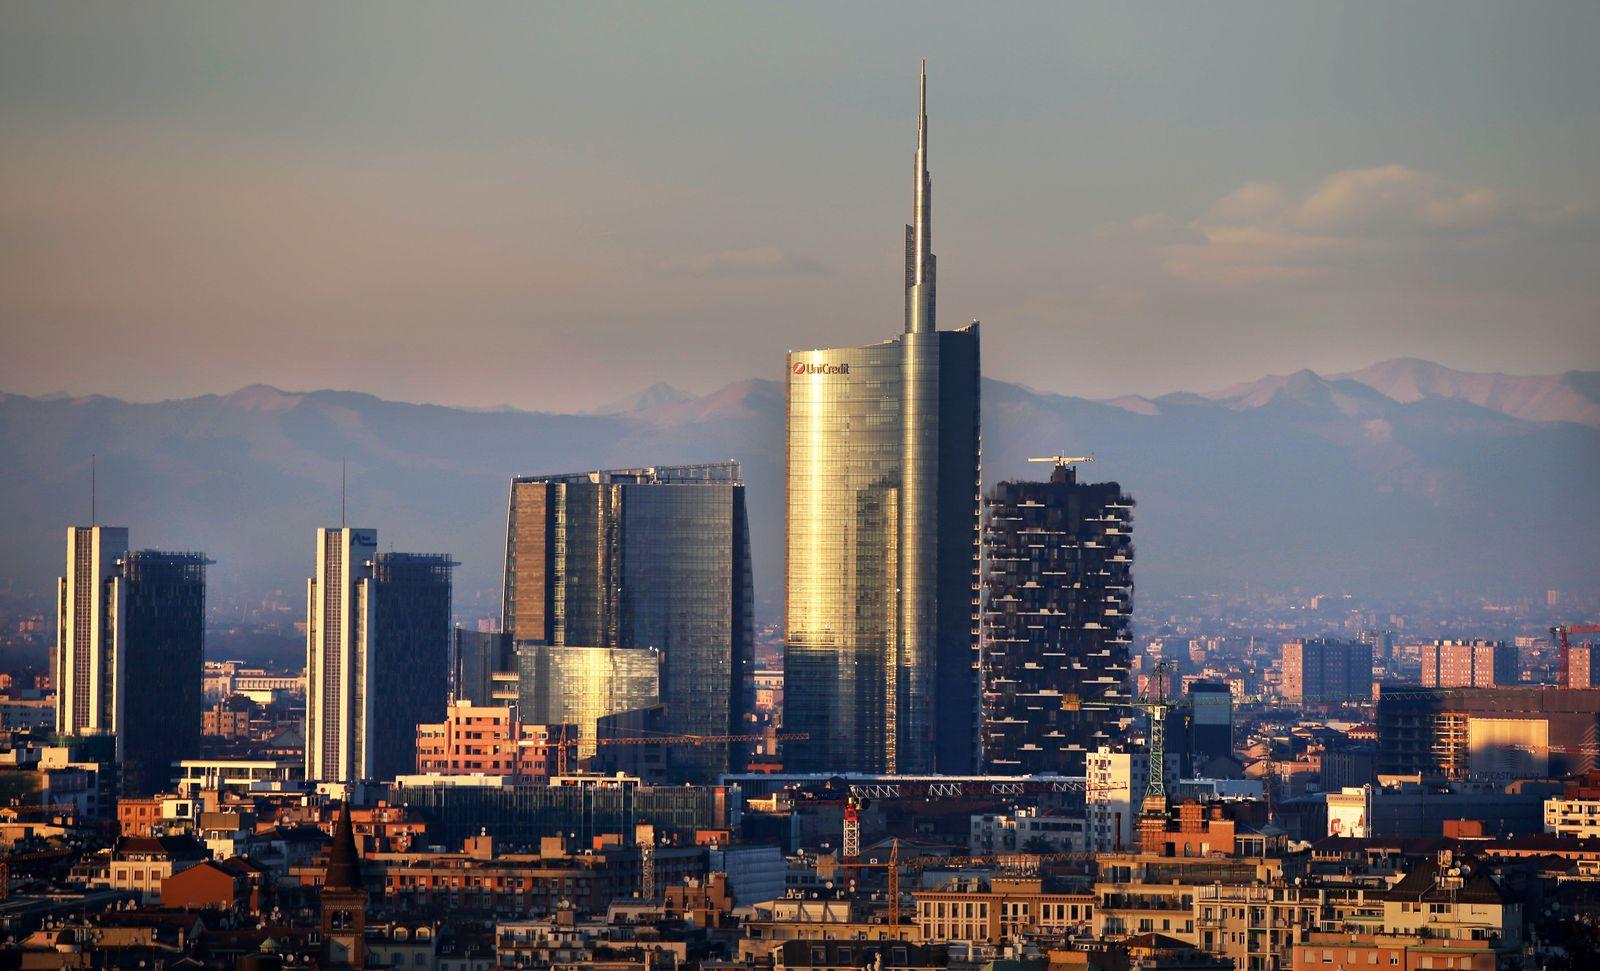 Italien / Konjunktur / Banken / Bankenviertel Mailand